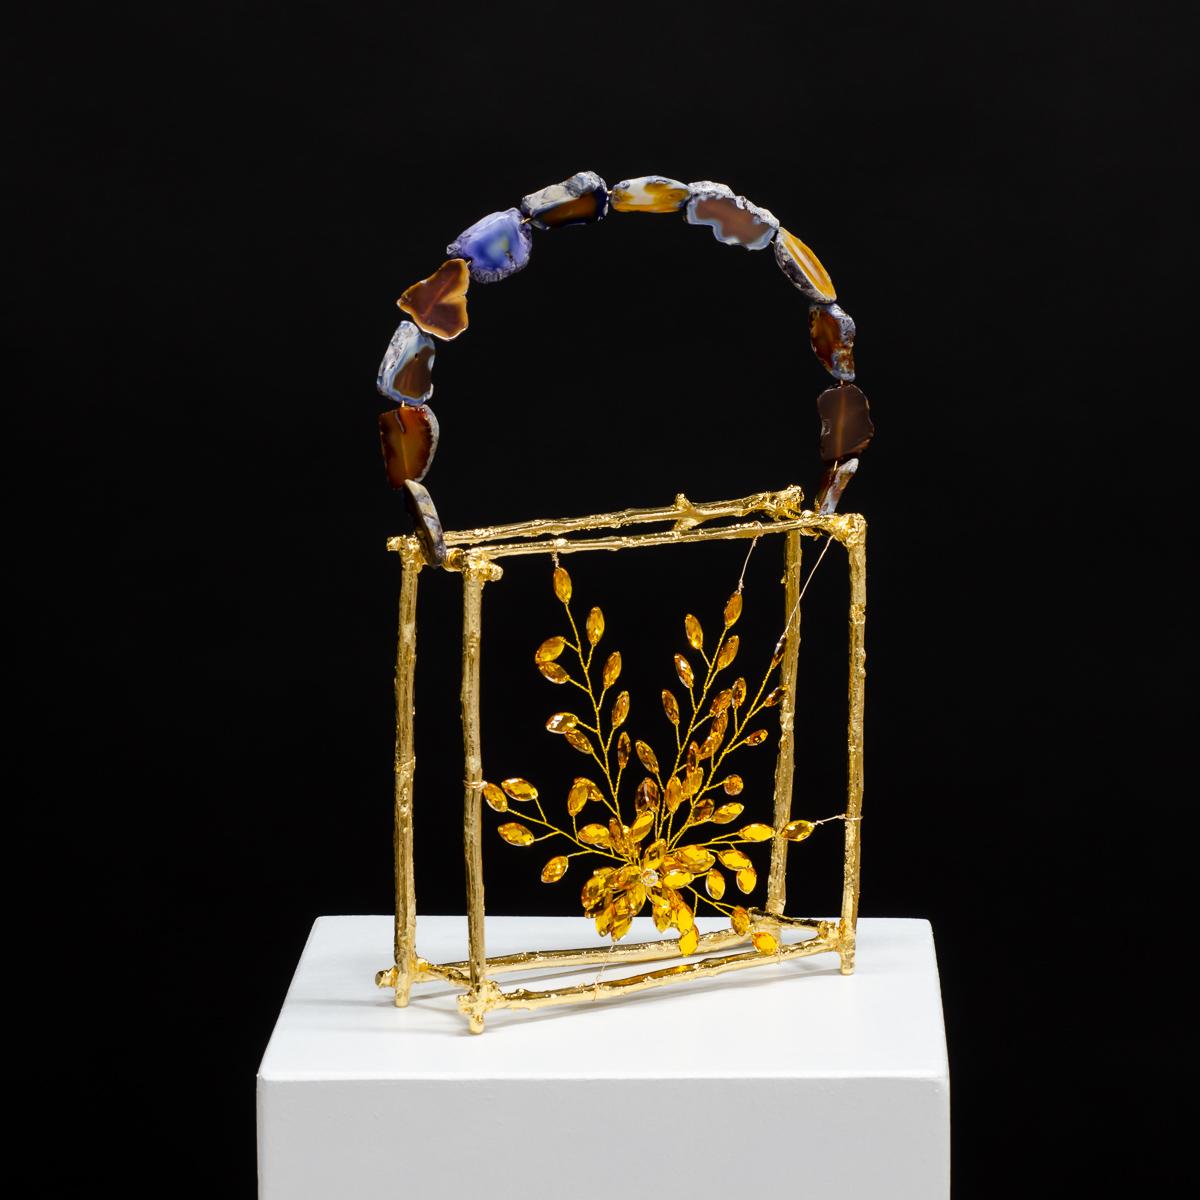 Sculpture by Beatriz Gerenstein. Handbag made in Bronze, 24K Gold, Citrines and Agate